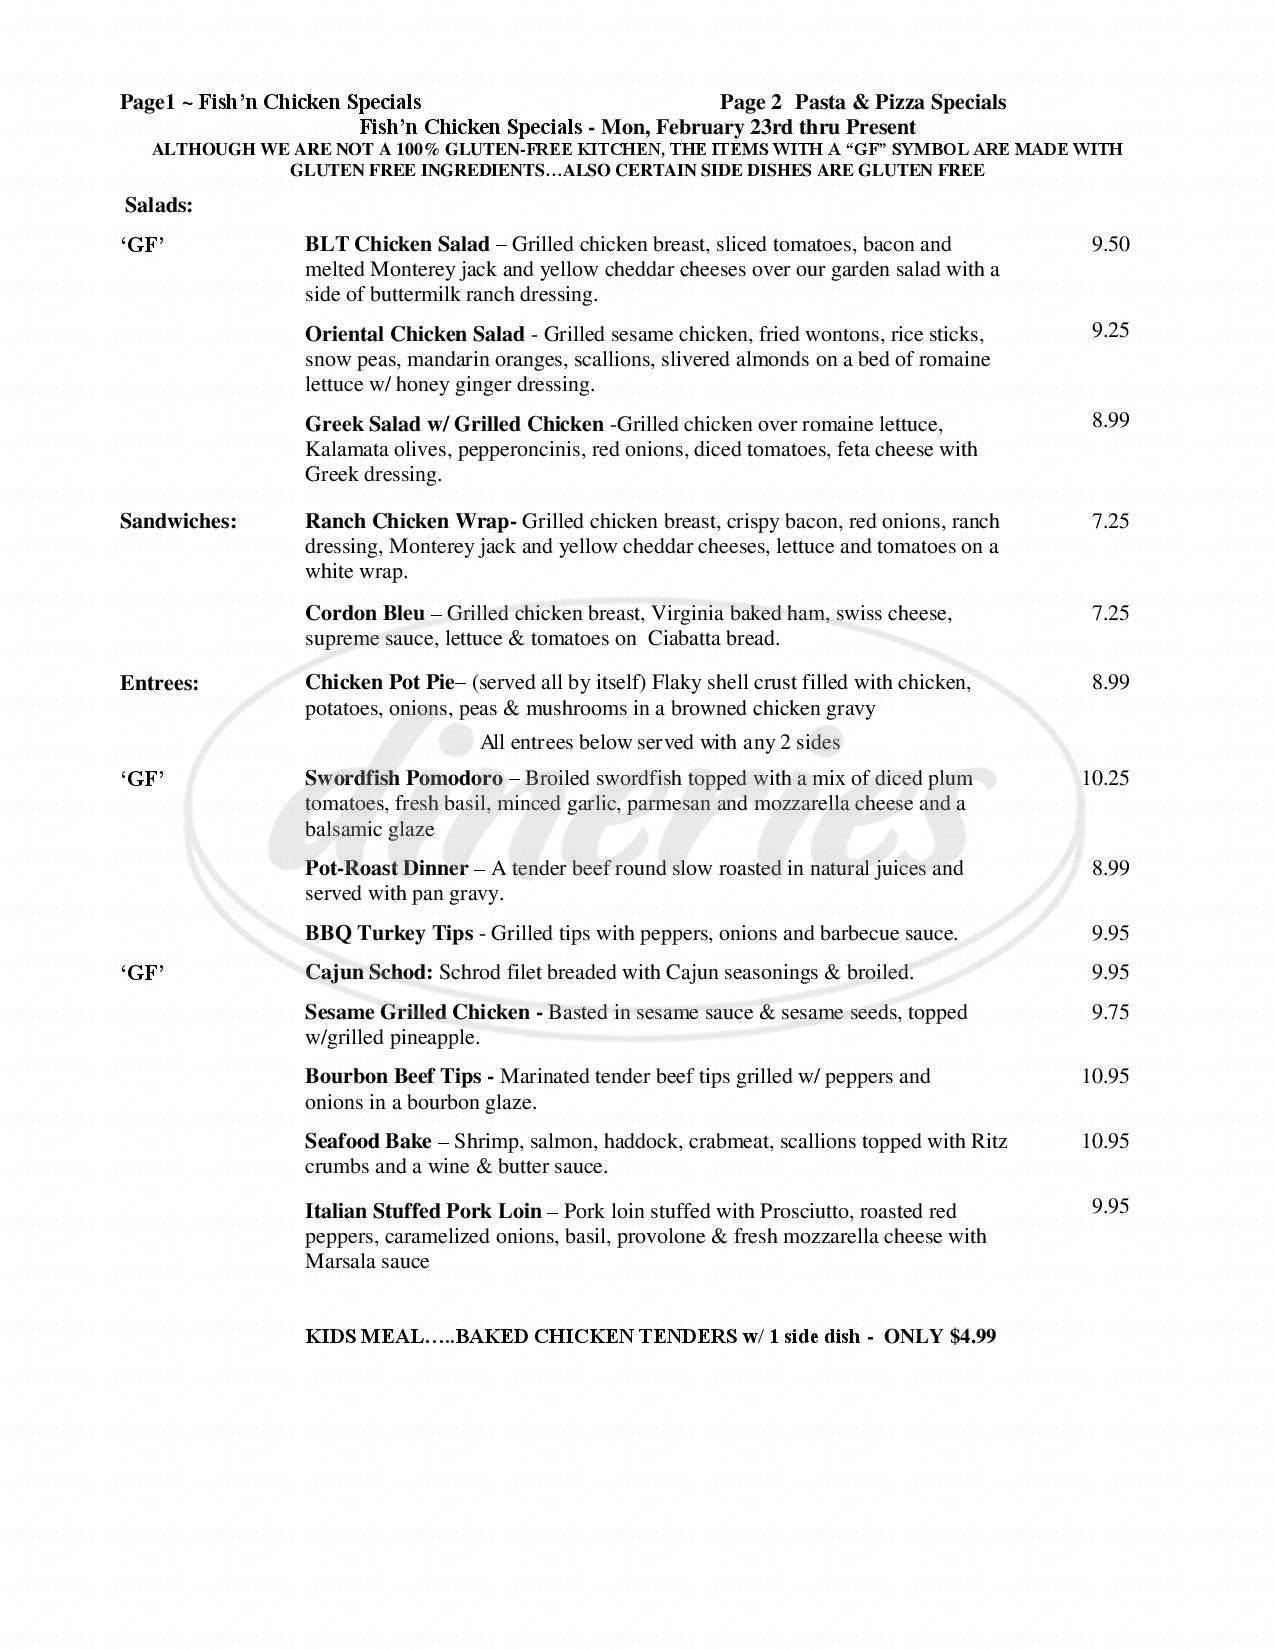 menu for Fish n Chicken